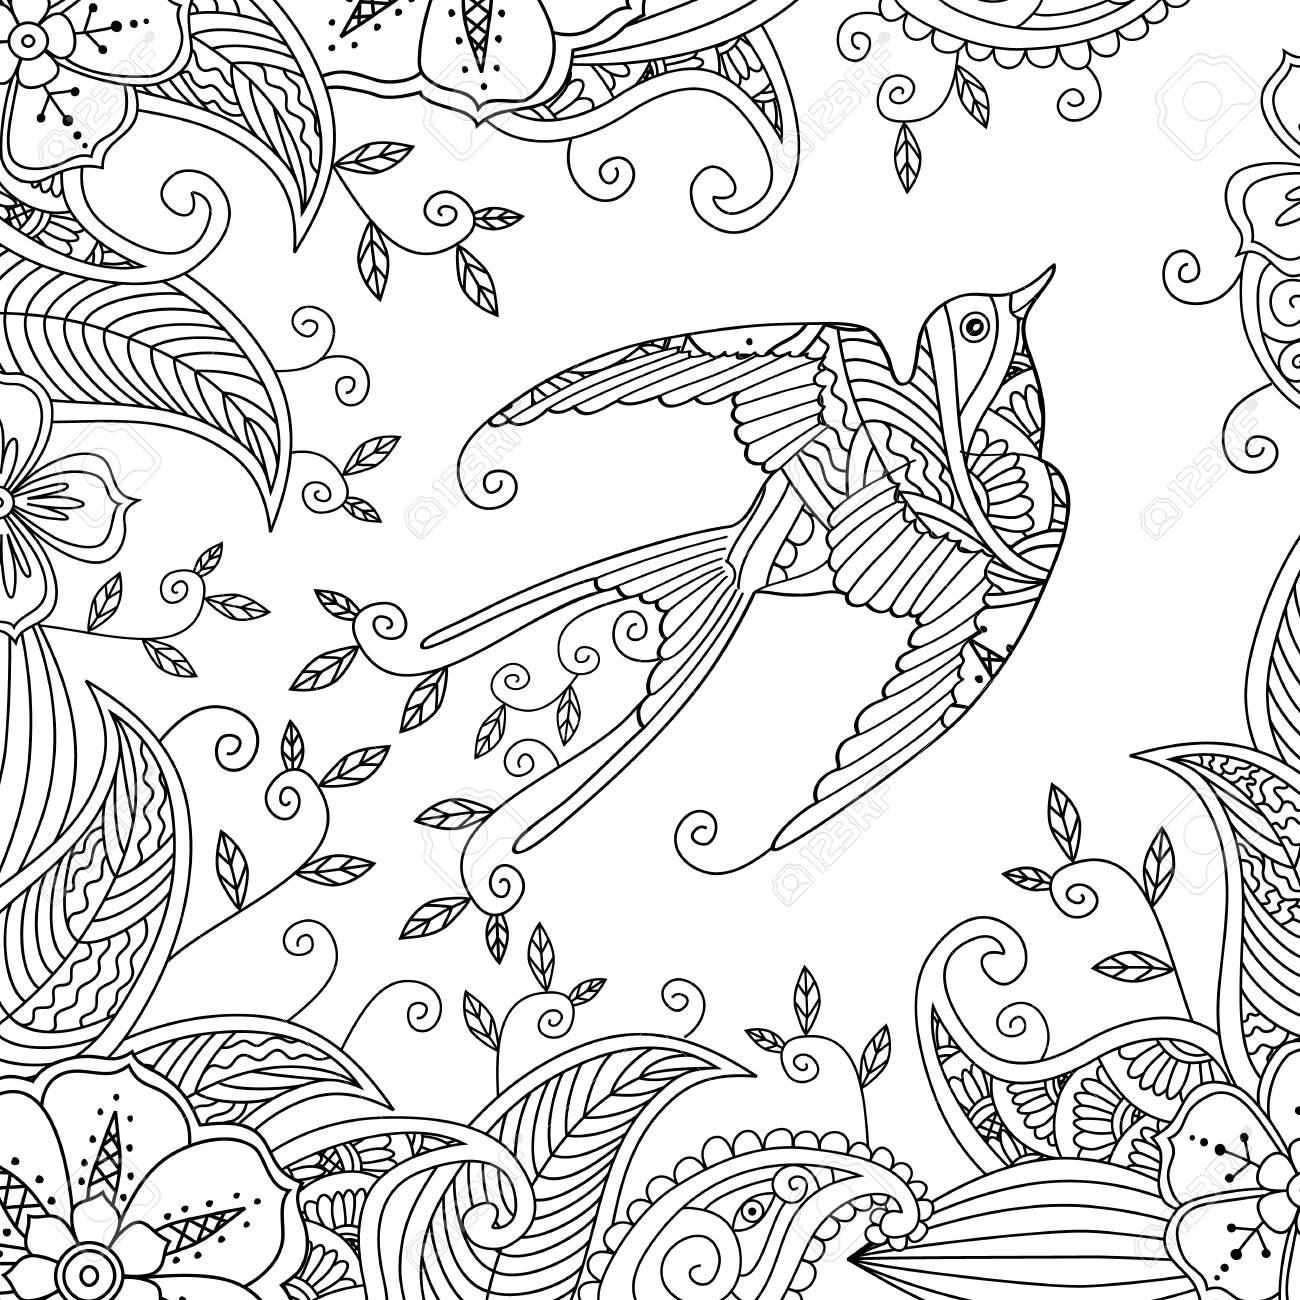 Bonito Pájaro Rosado Enojado Para Colorear Modelo - Dibujos Para ...